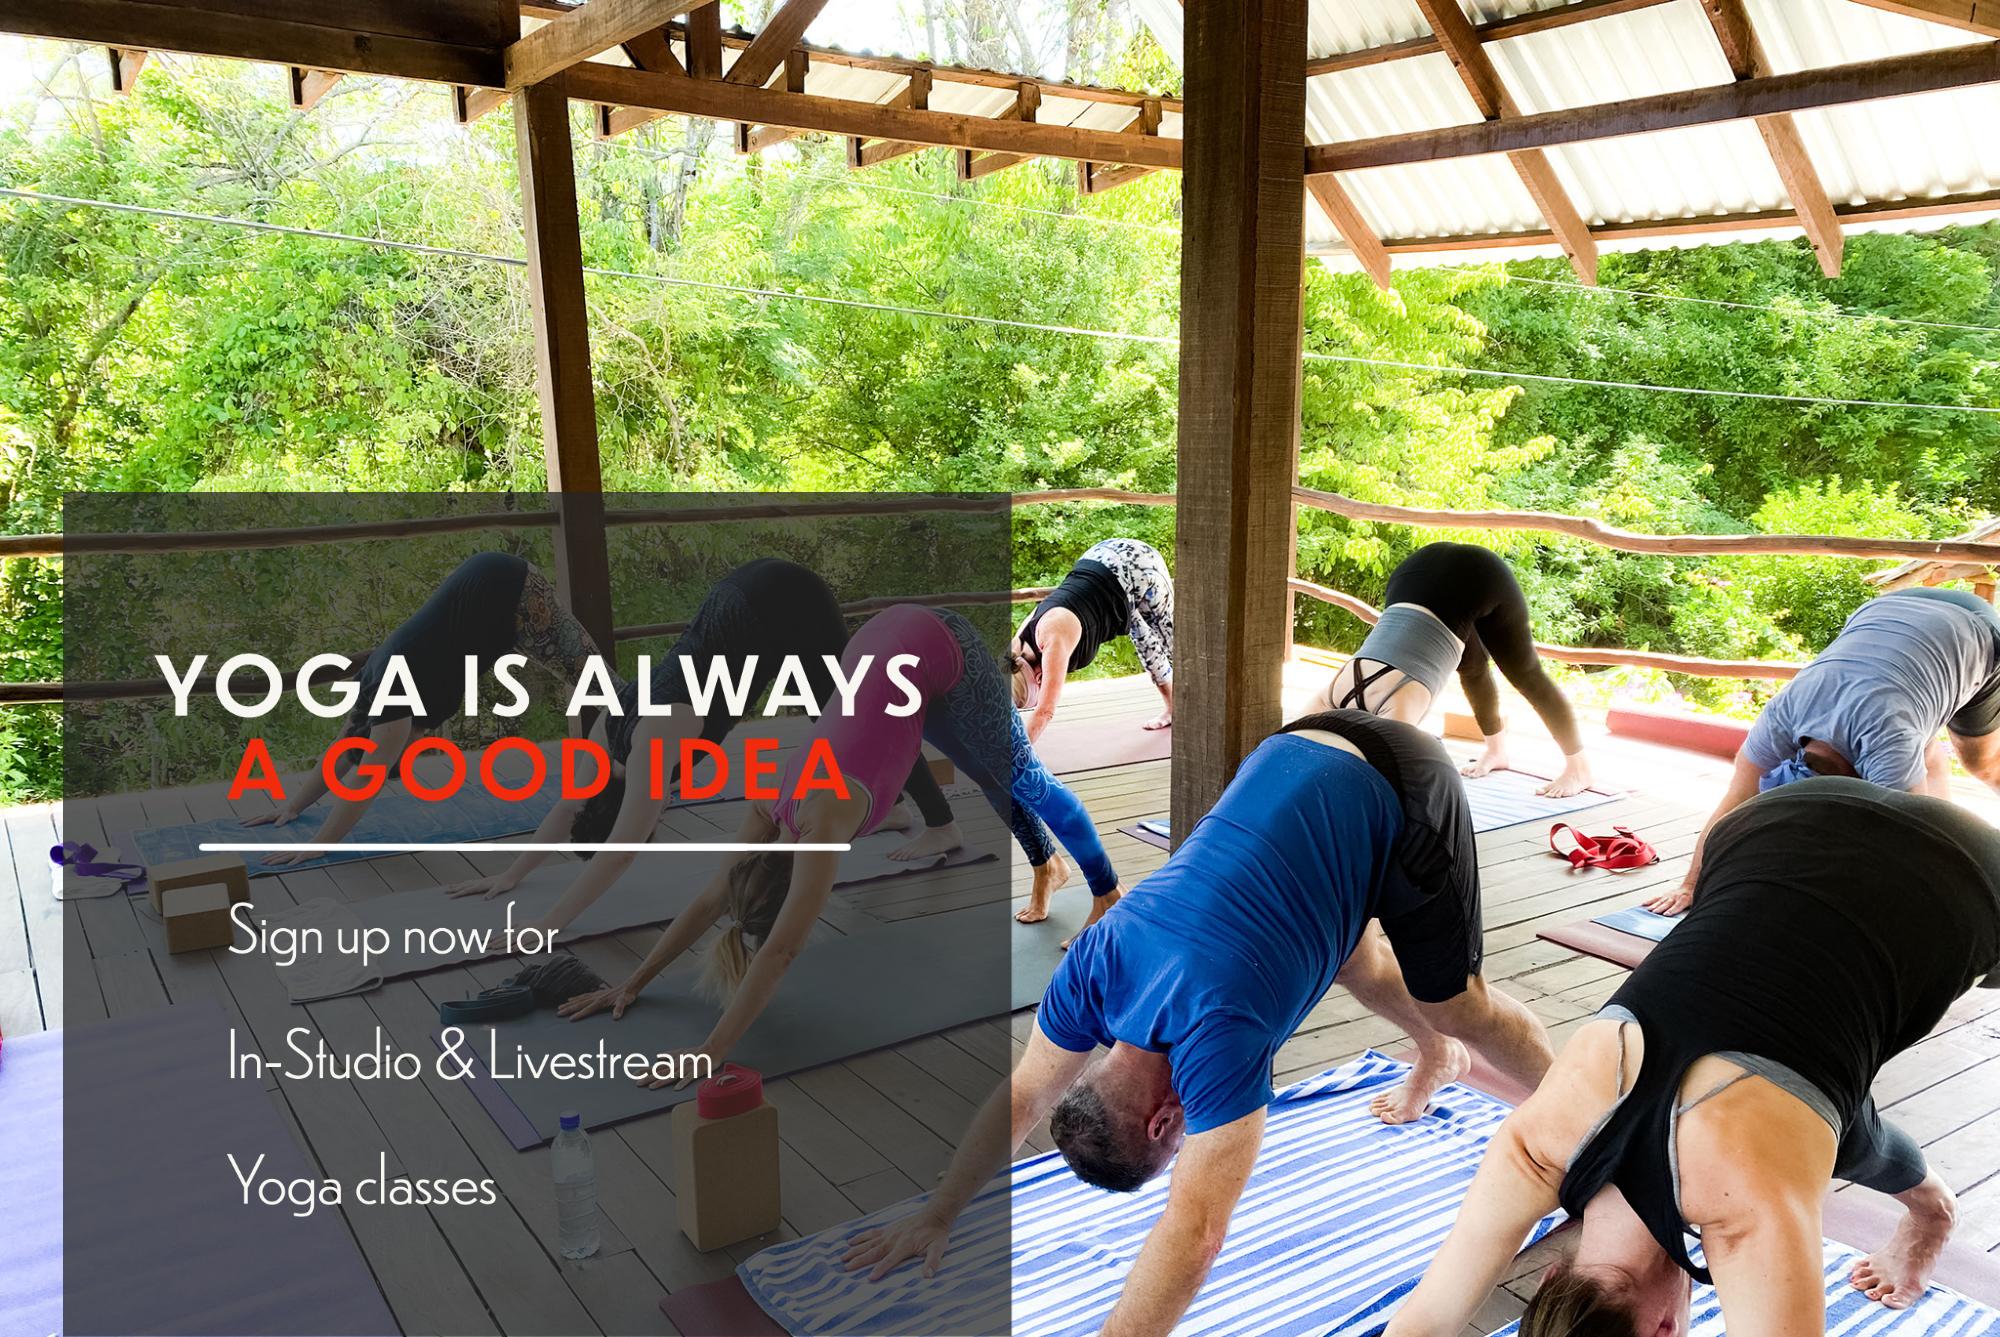 Yoga is always a good idea! Instudio and livestream classes!